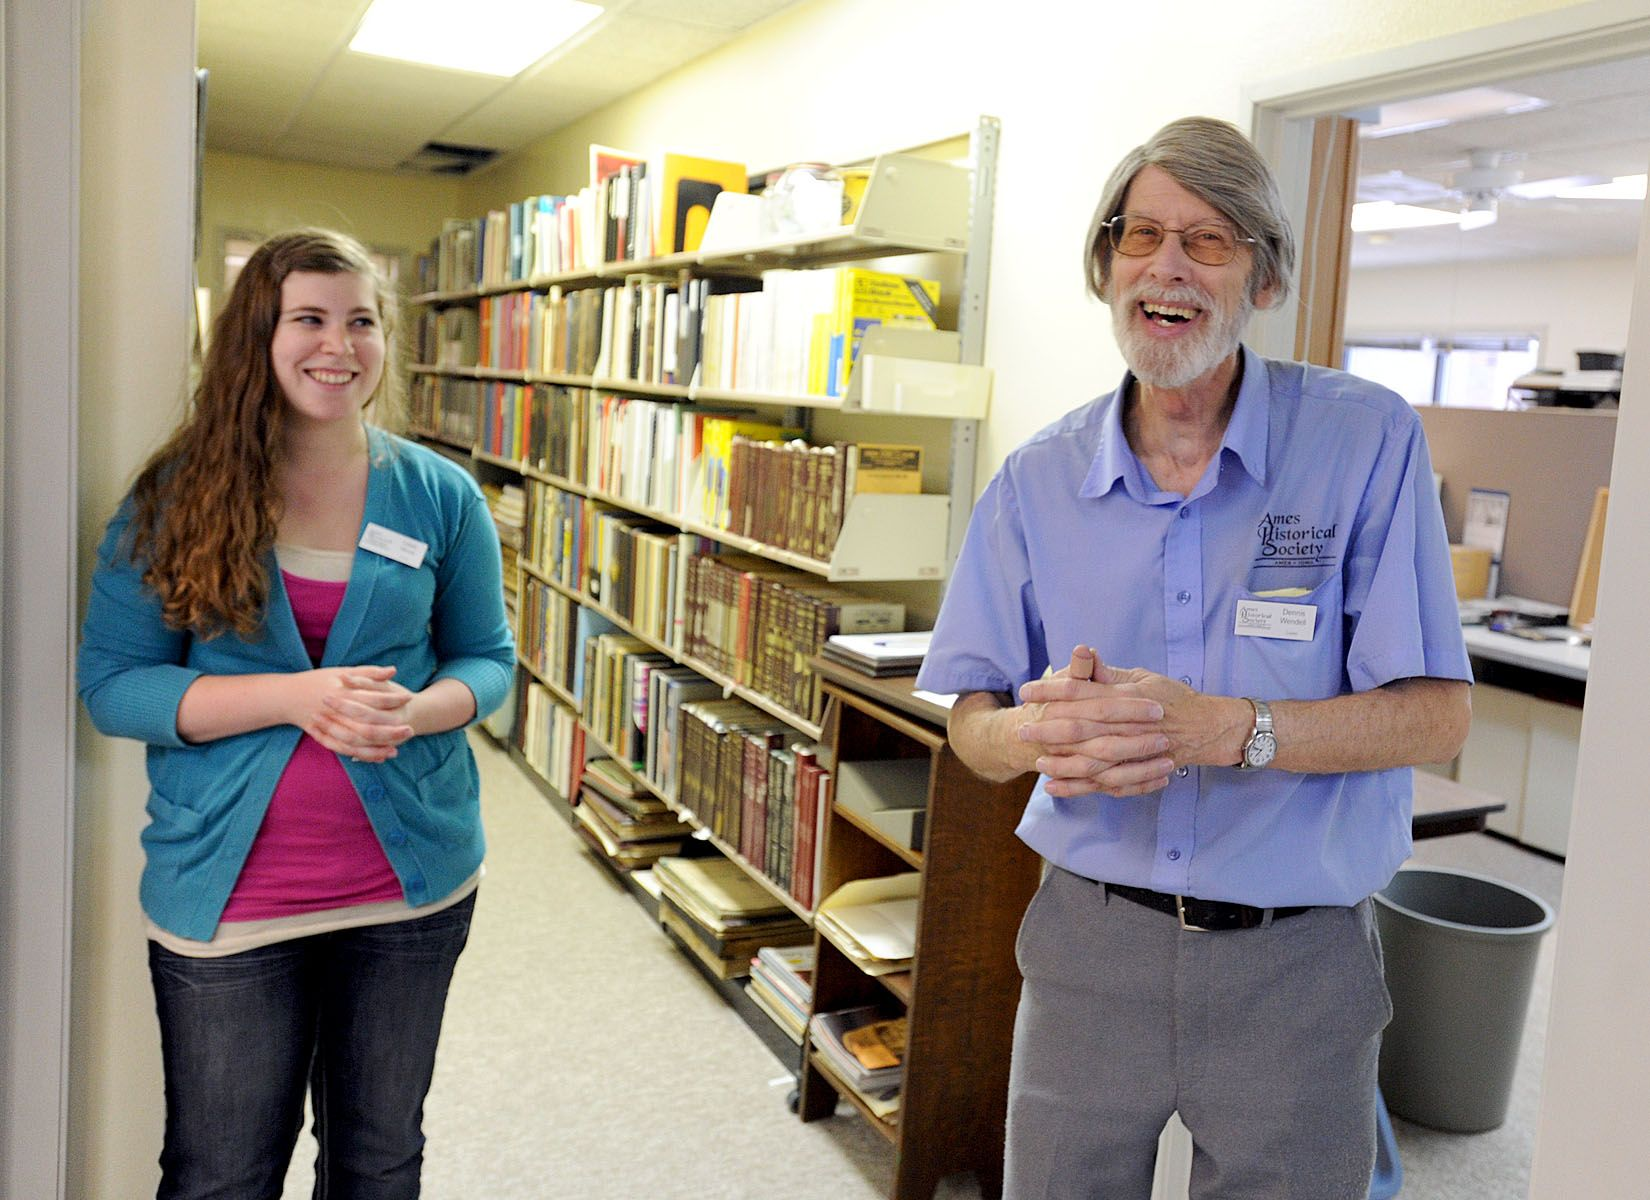 Ames Historical Society Curator Dennis C Wendell And Director Casie Vance Joke Around Inside The Organization S Newly Renovat Tribune Historical Society Jokes